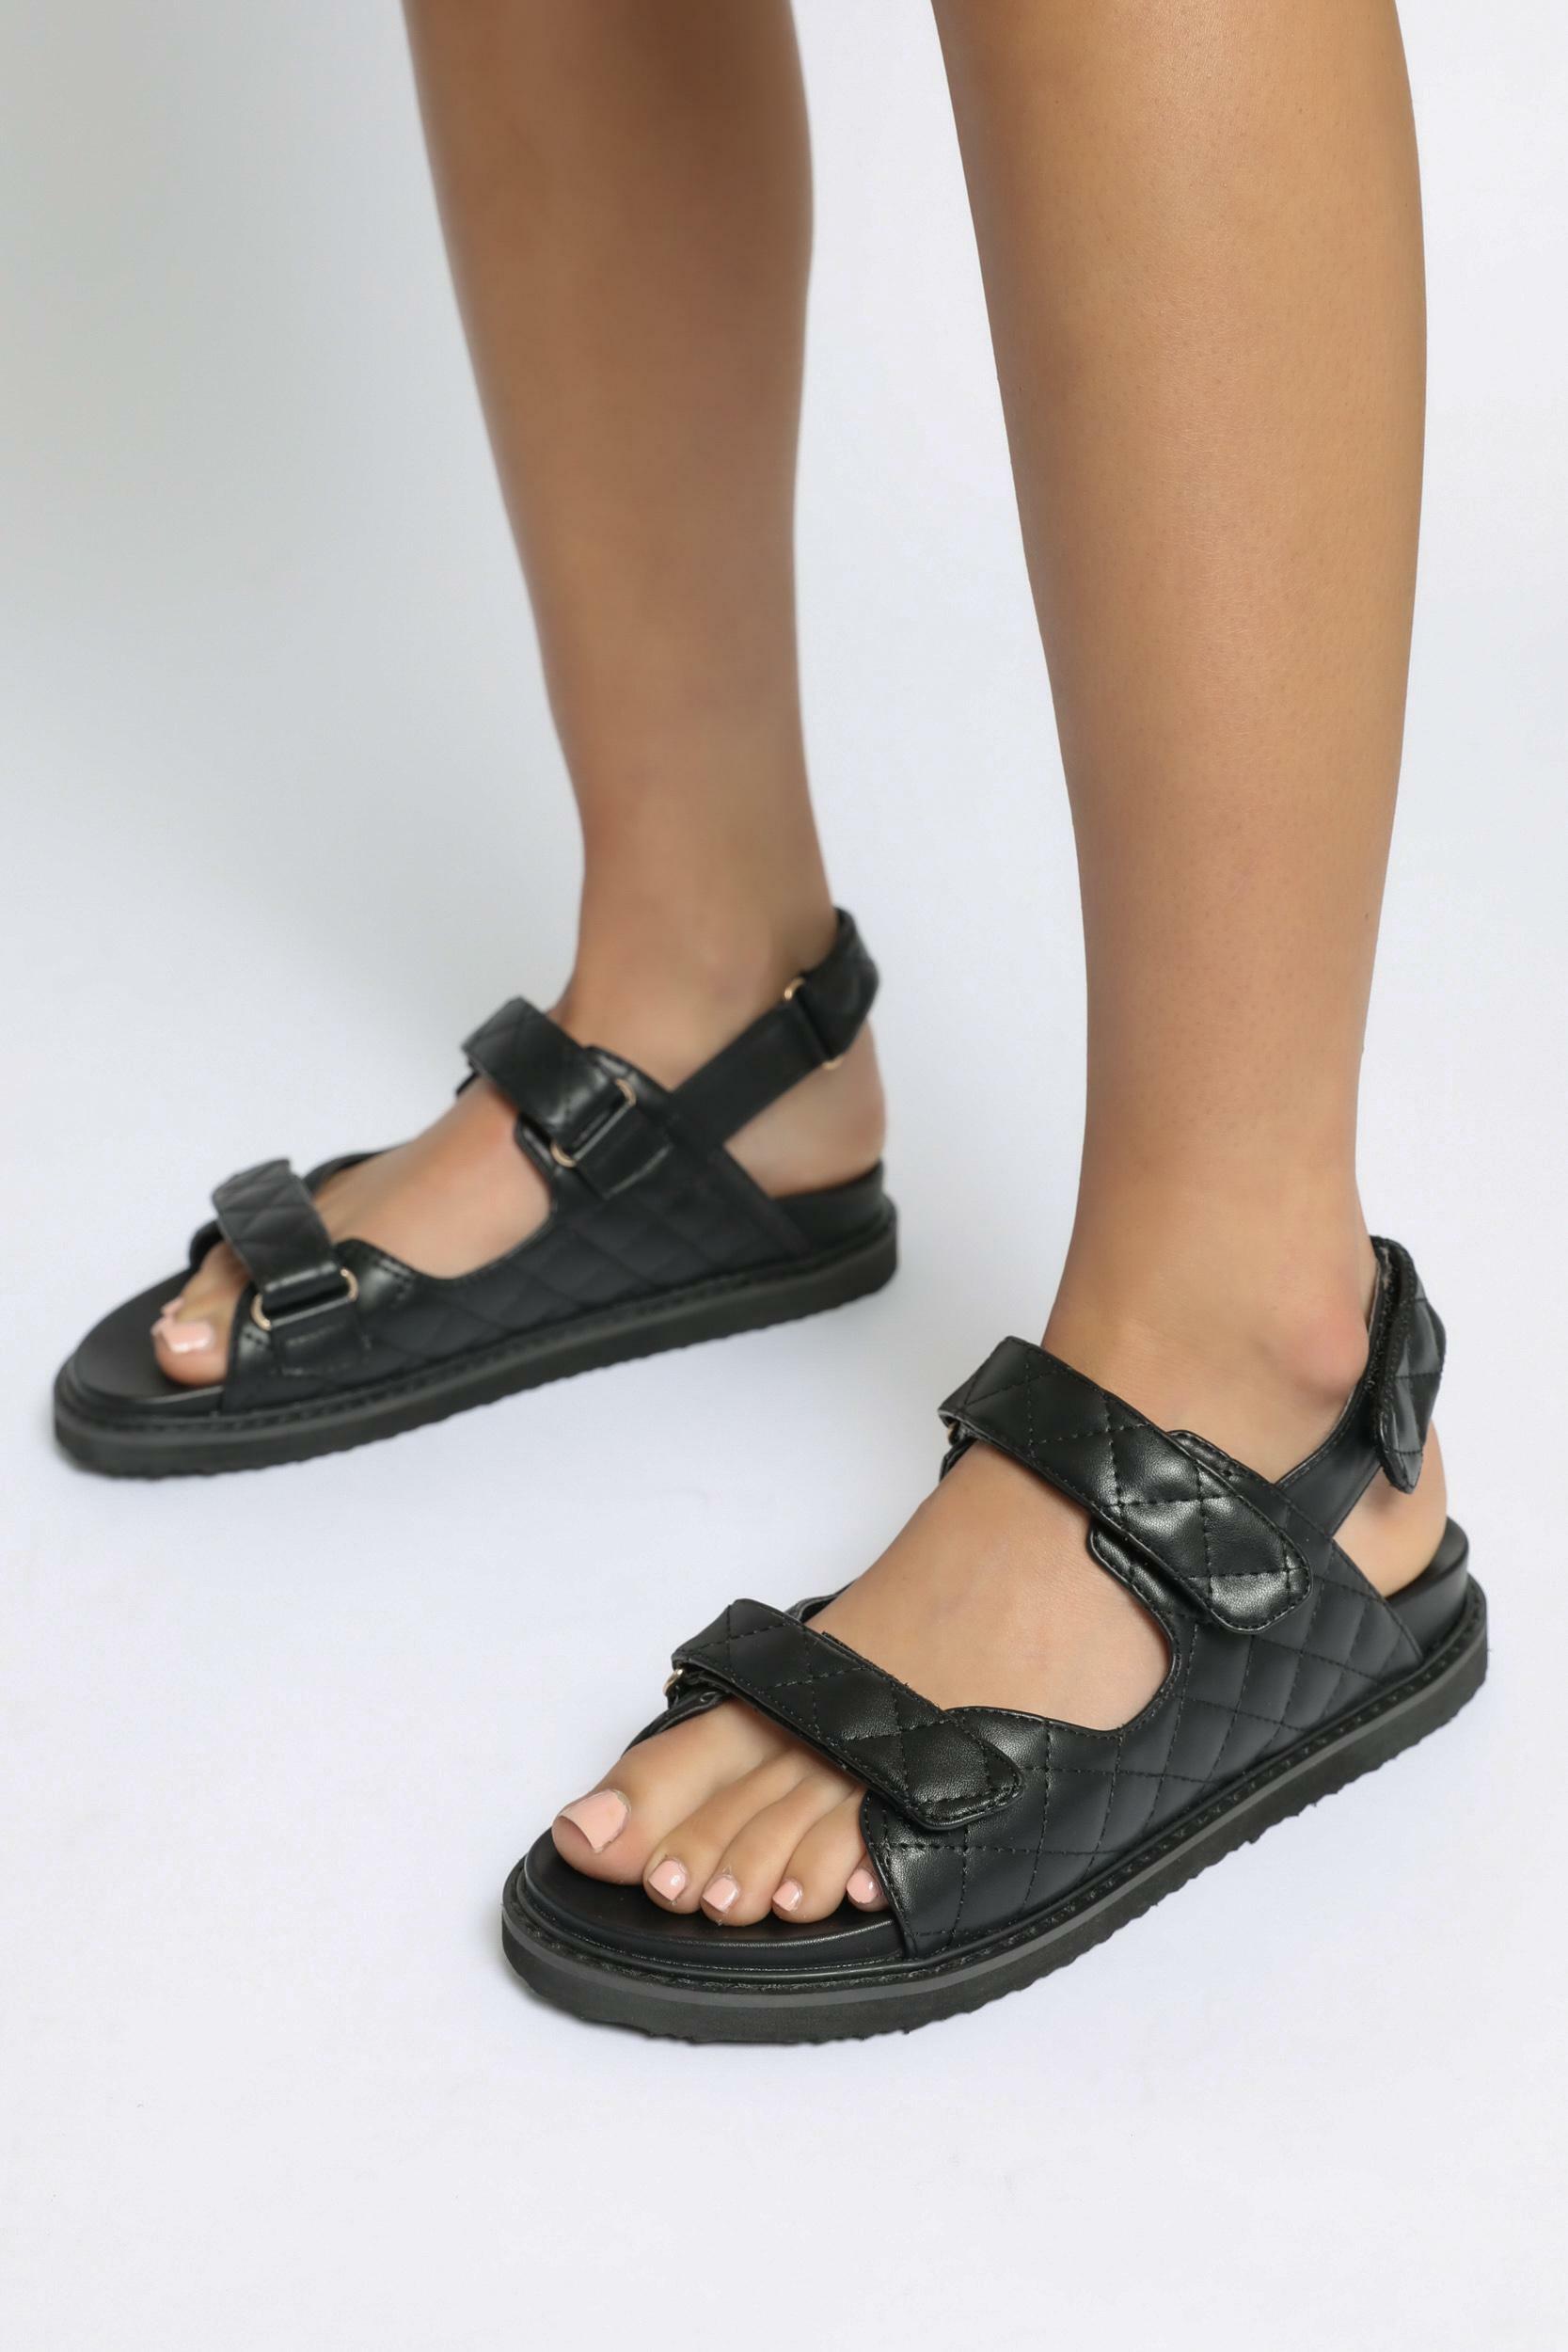 Billini - Zora Sandals in Black - 5, Black, hi-res image number null